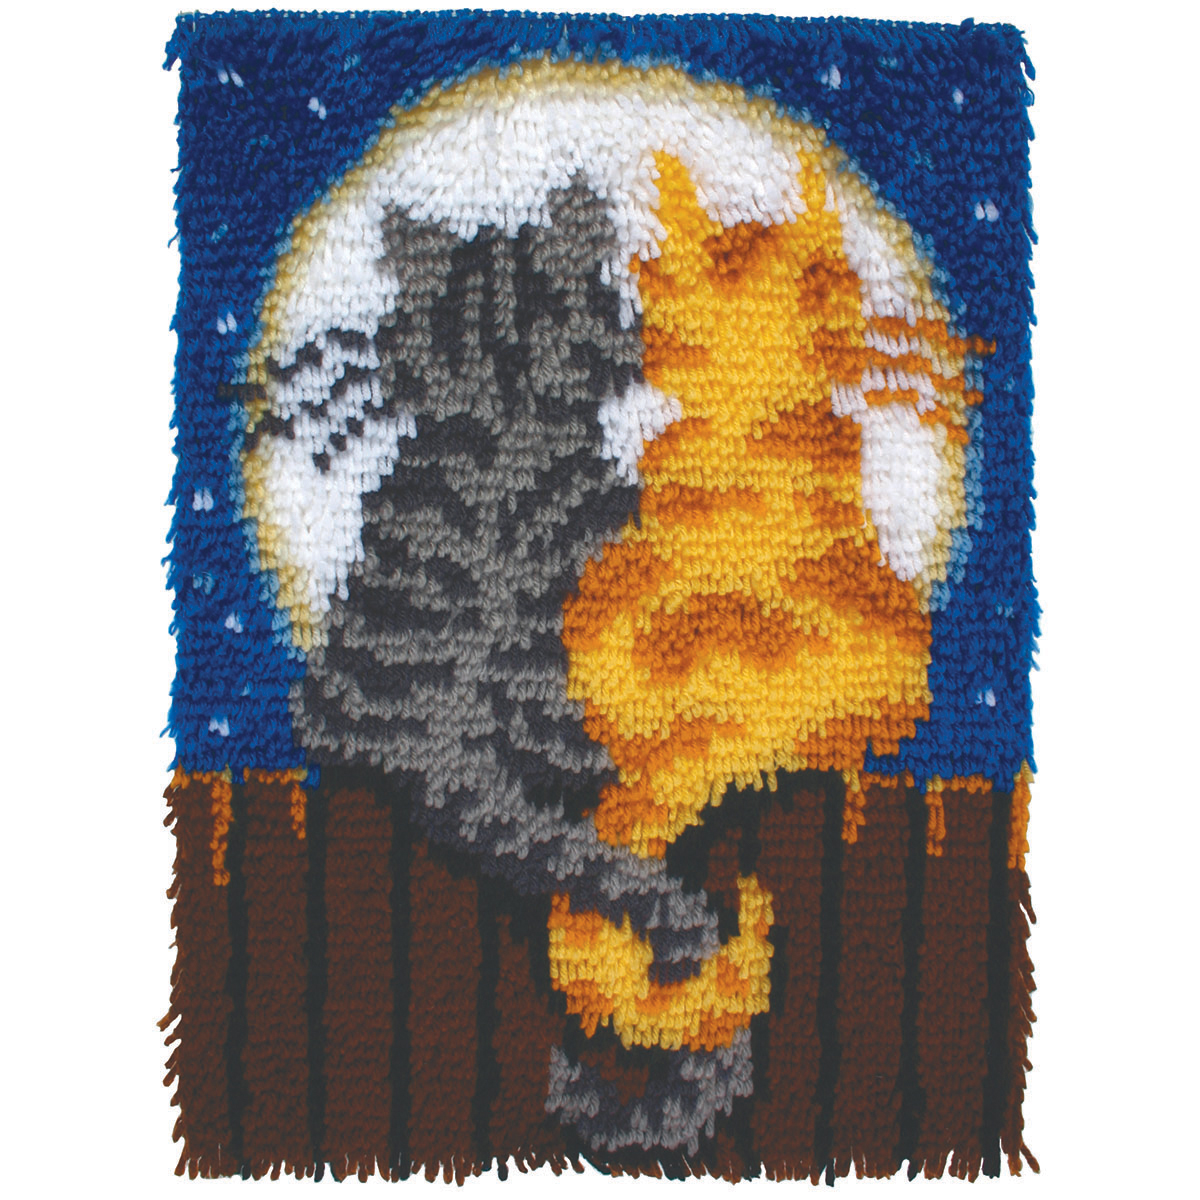 Caron Wonderart Latch Hook Kit 15 X20 Moonlight Meow